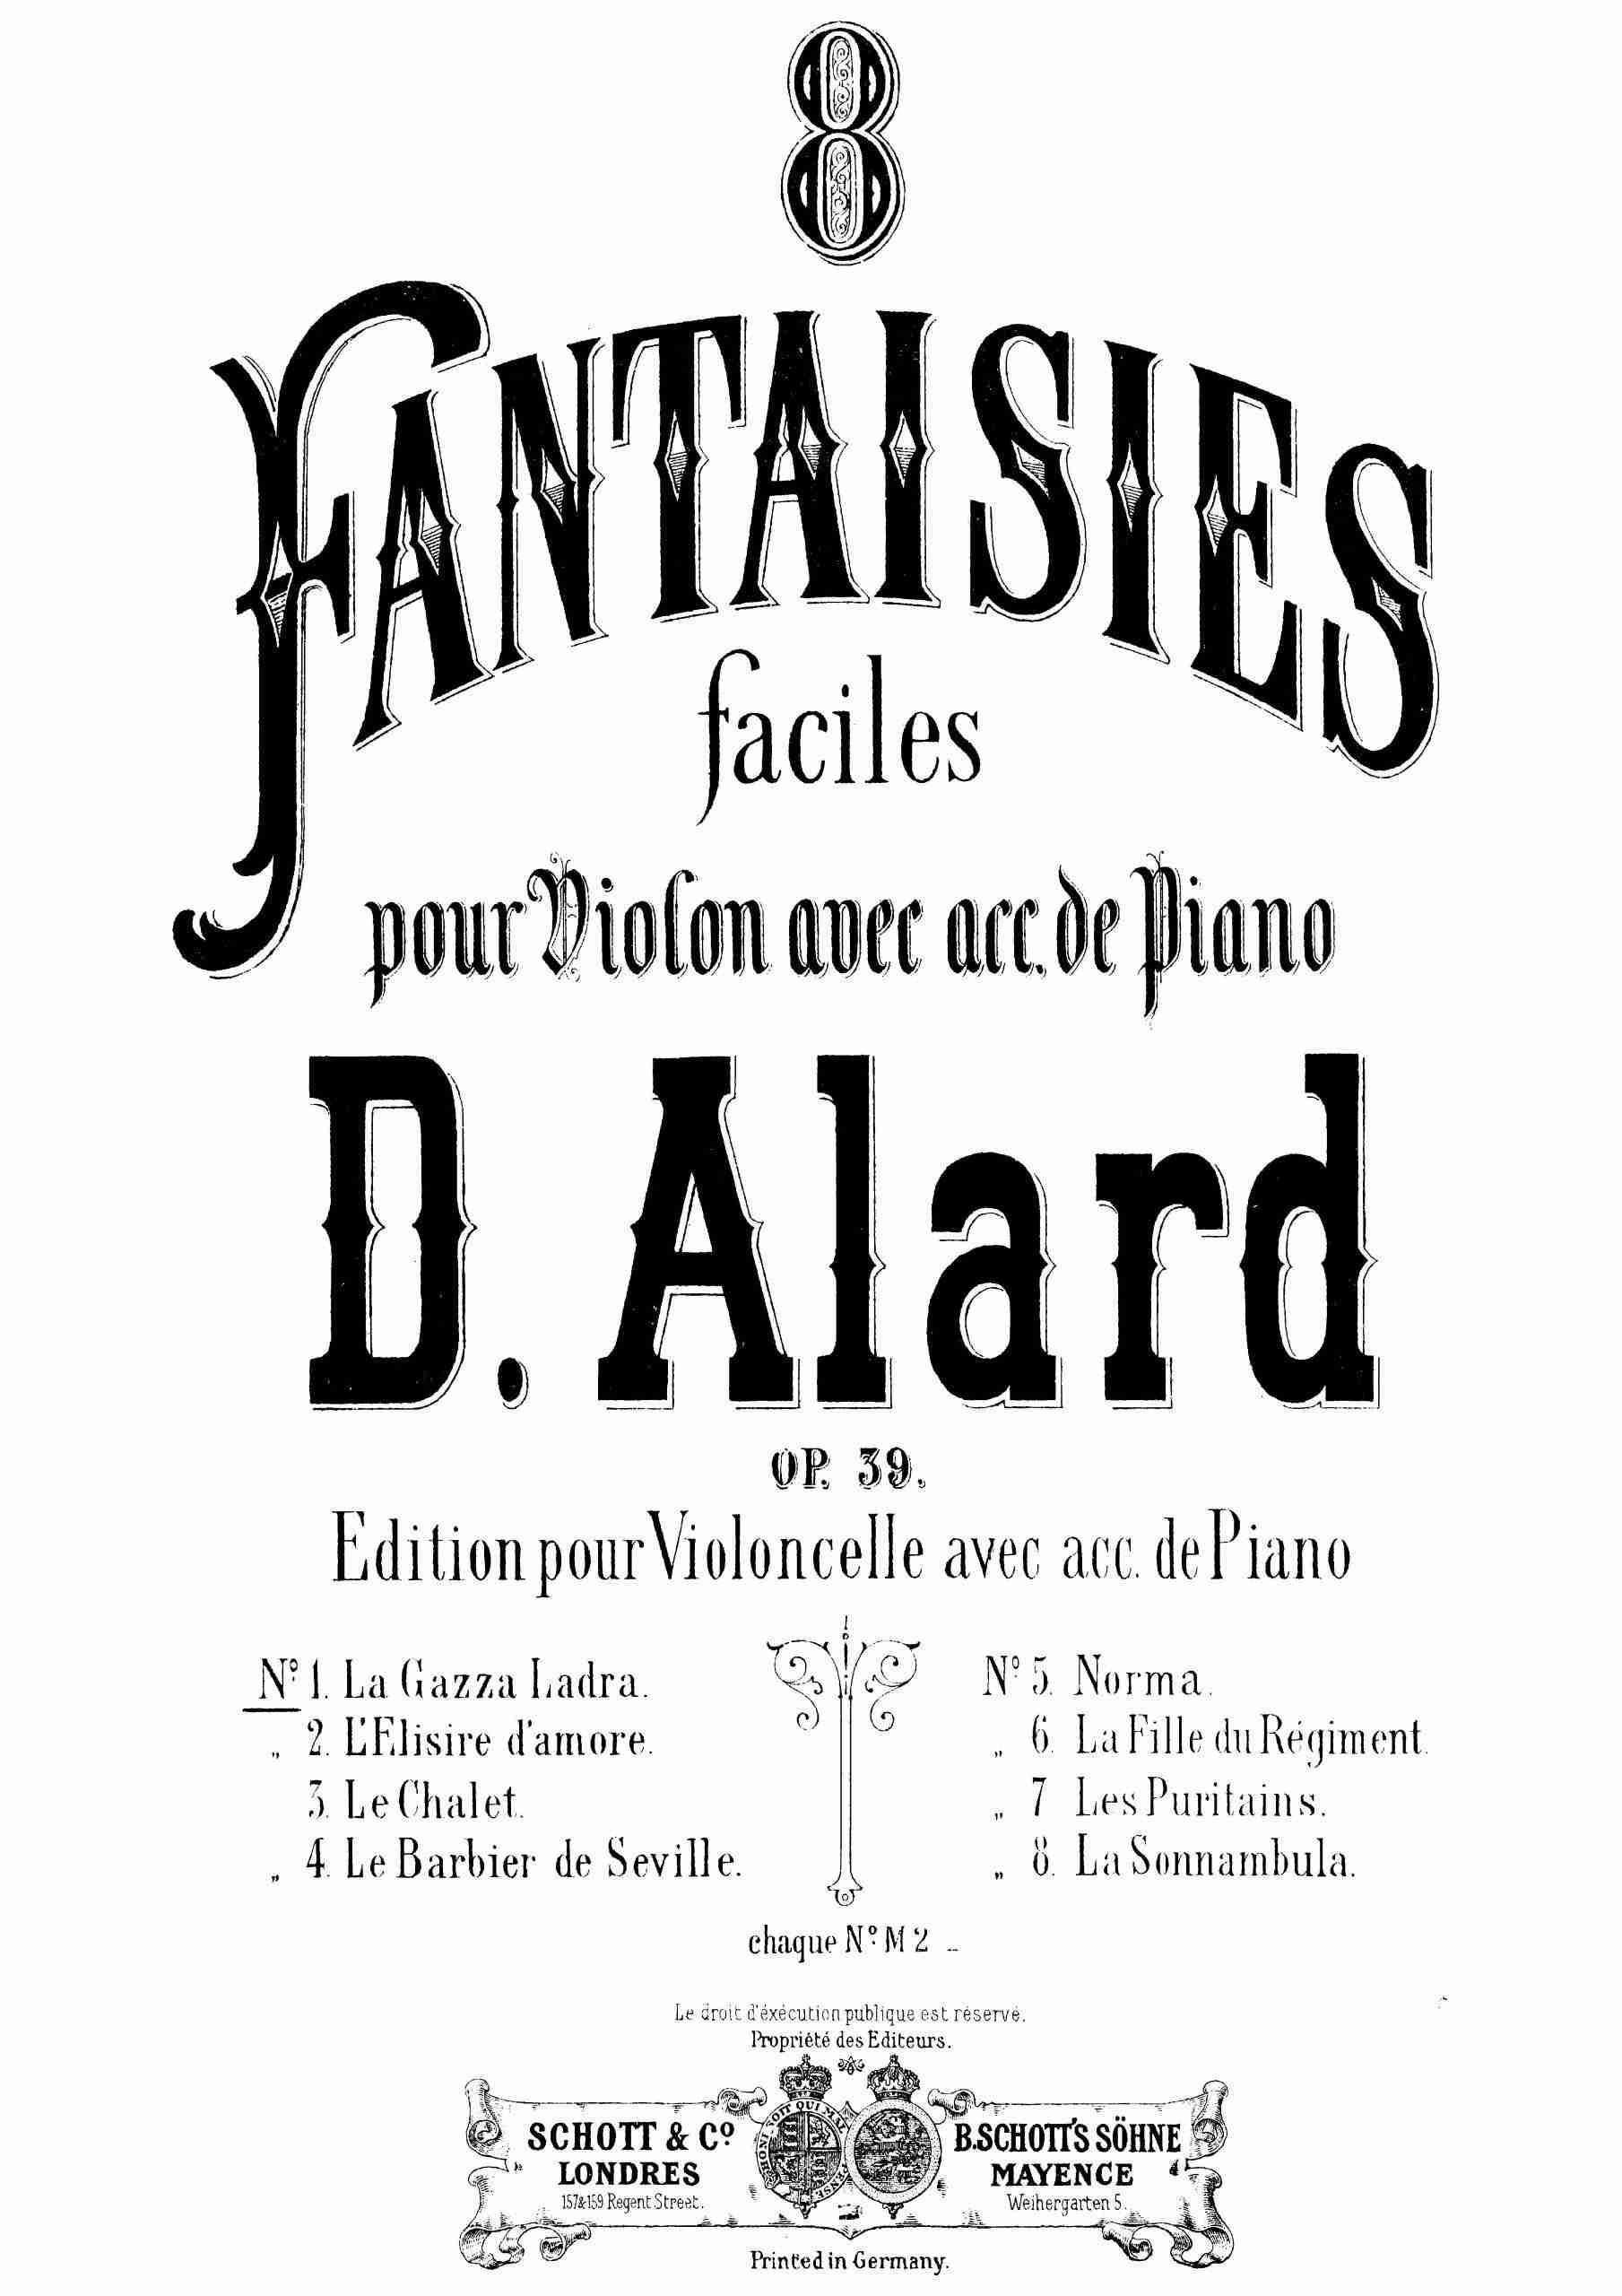 Alard, Jean Delphin - 8 Fantaisies faciles, Op.39 (no.1 pno)